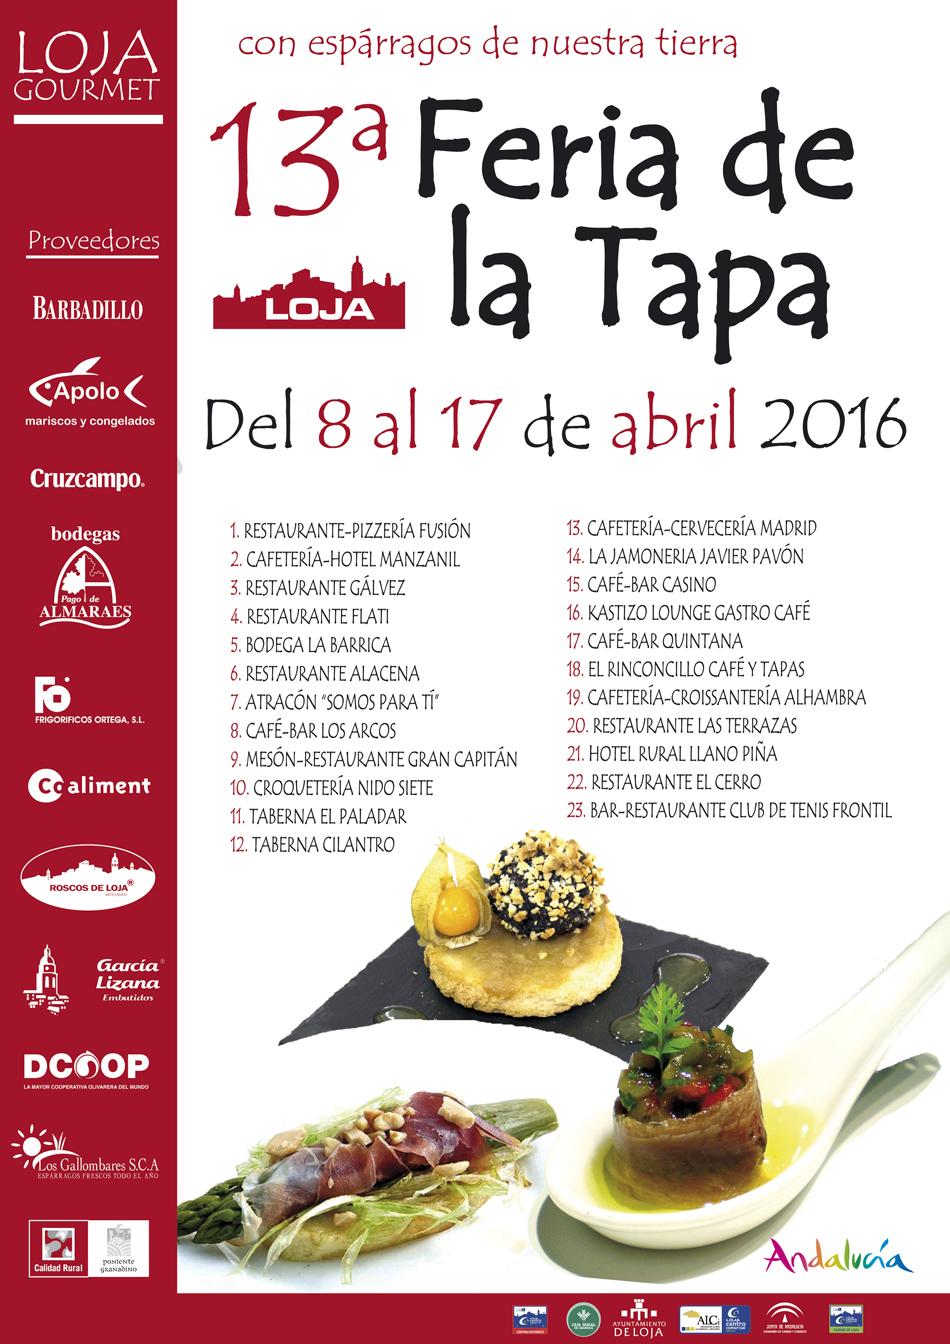 13ª Feria de la Tapa de Loja - del 8 al 17 de abril